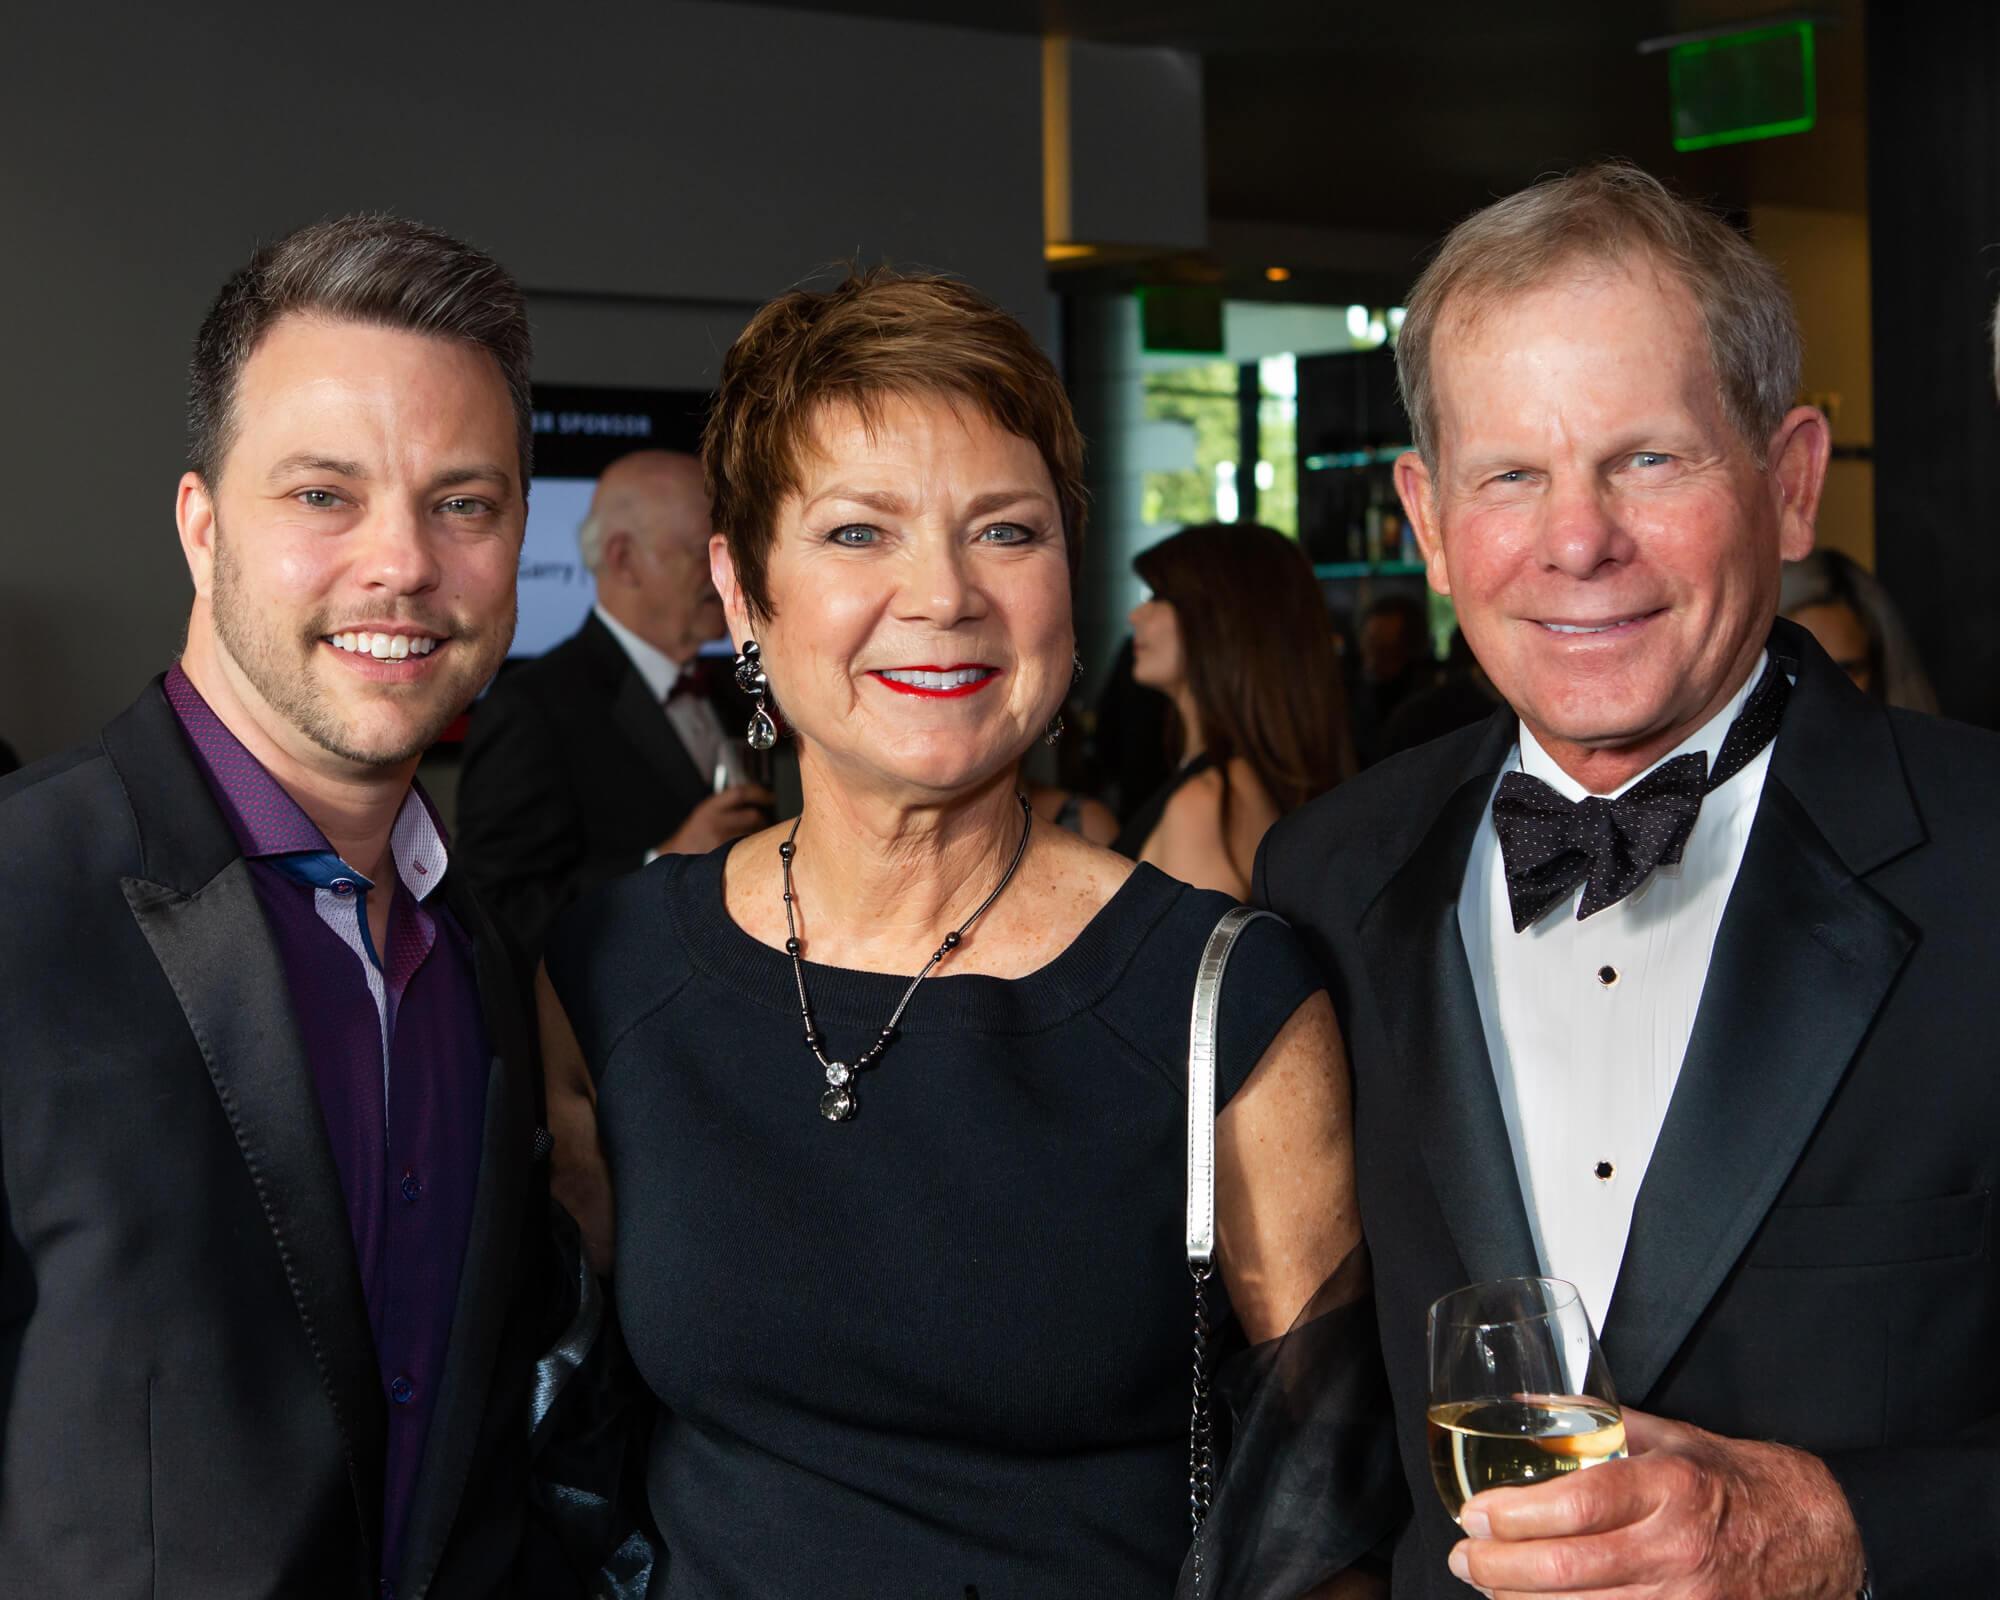 Sam Slate, Kathy Hutto and Allen Beinke